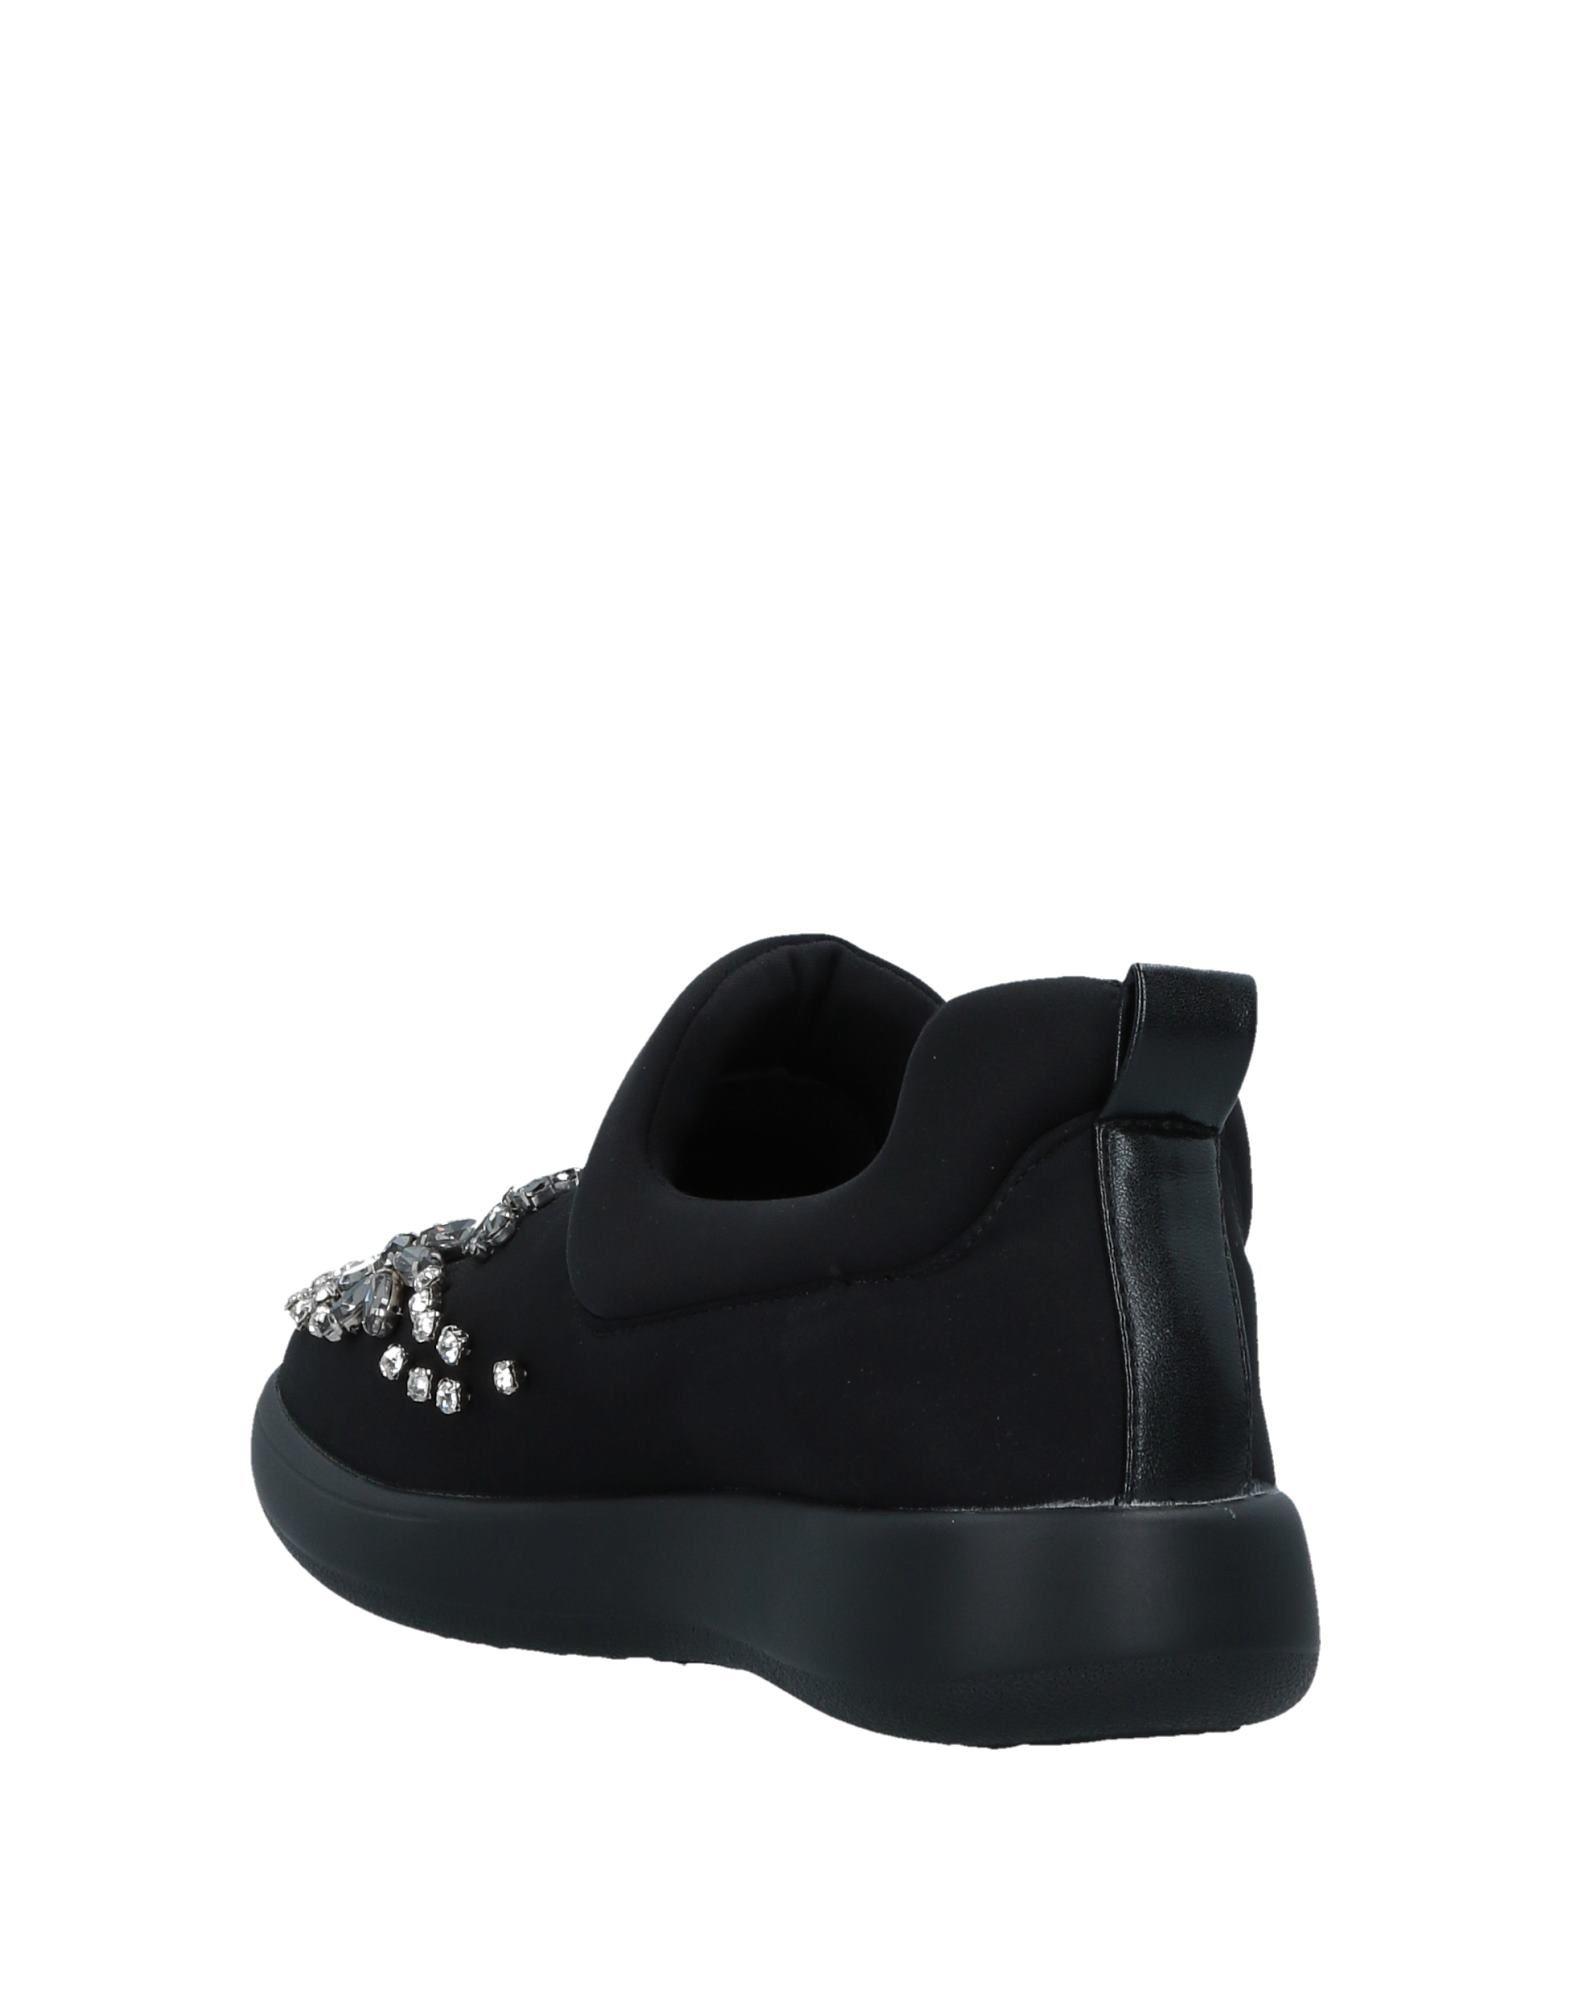 Onako' Sneakers Damen Gutes Preis-Leistungs-Verhältnis, es es Preis-Leistungs-Verhältnis, lohnt sich b42cfc